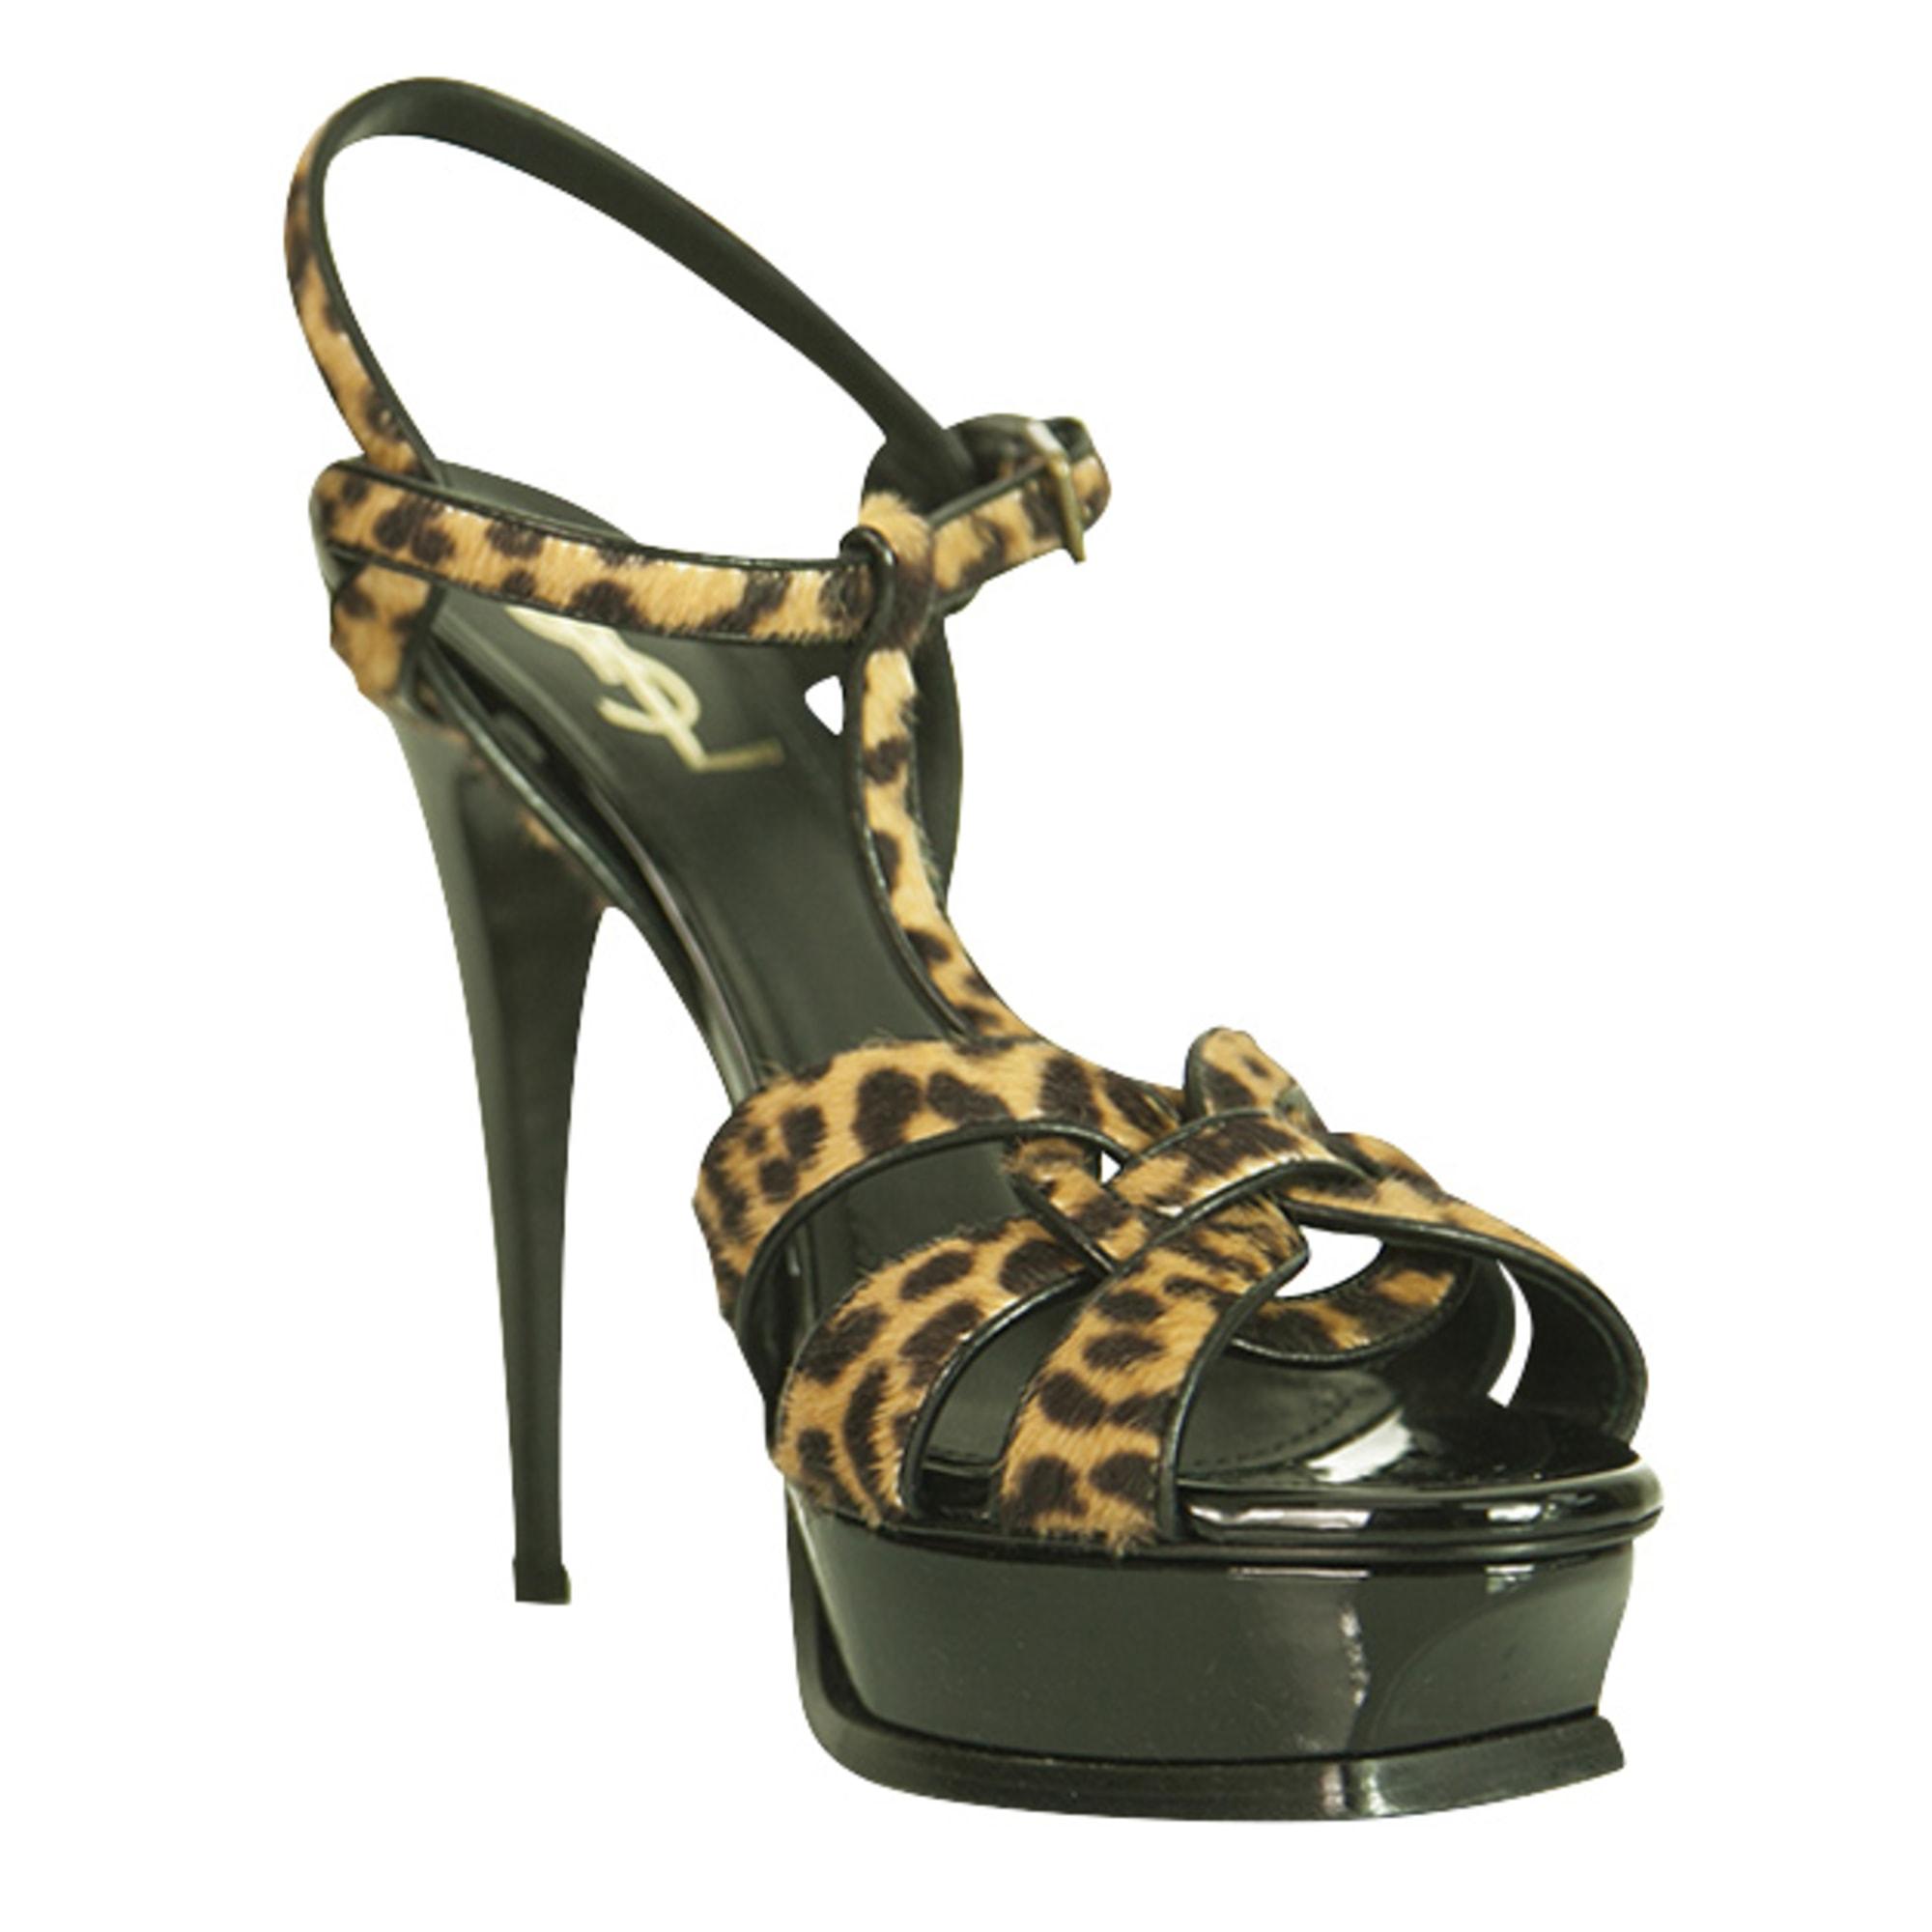 Heeled Sandals YVES SAINT LAURENT Multicolor